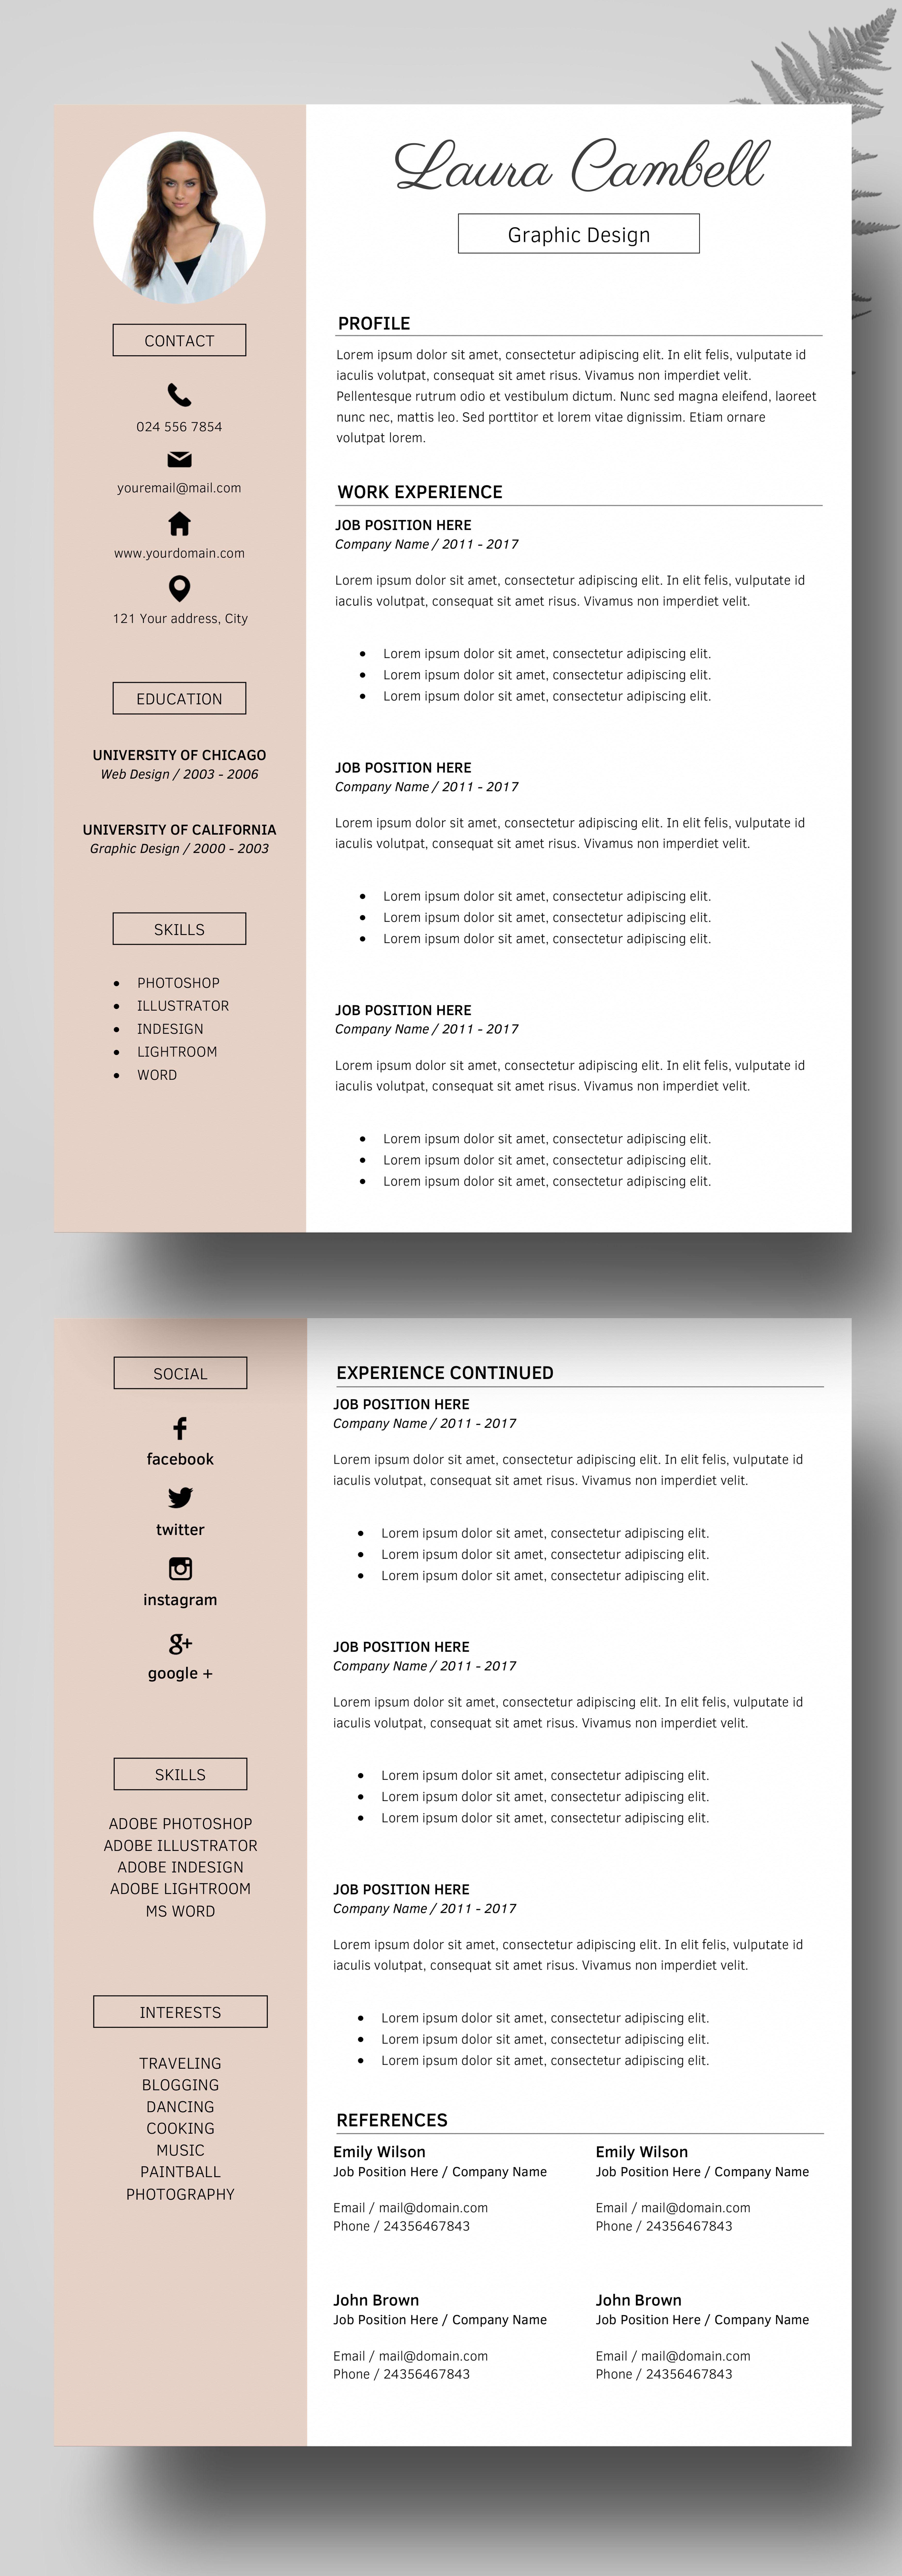 Pin on Design Tools